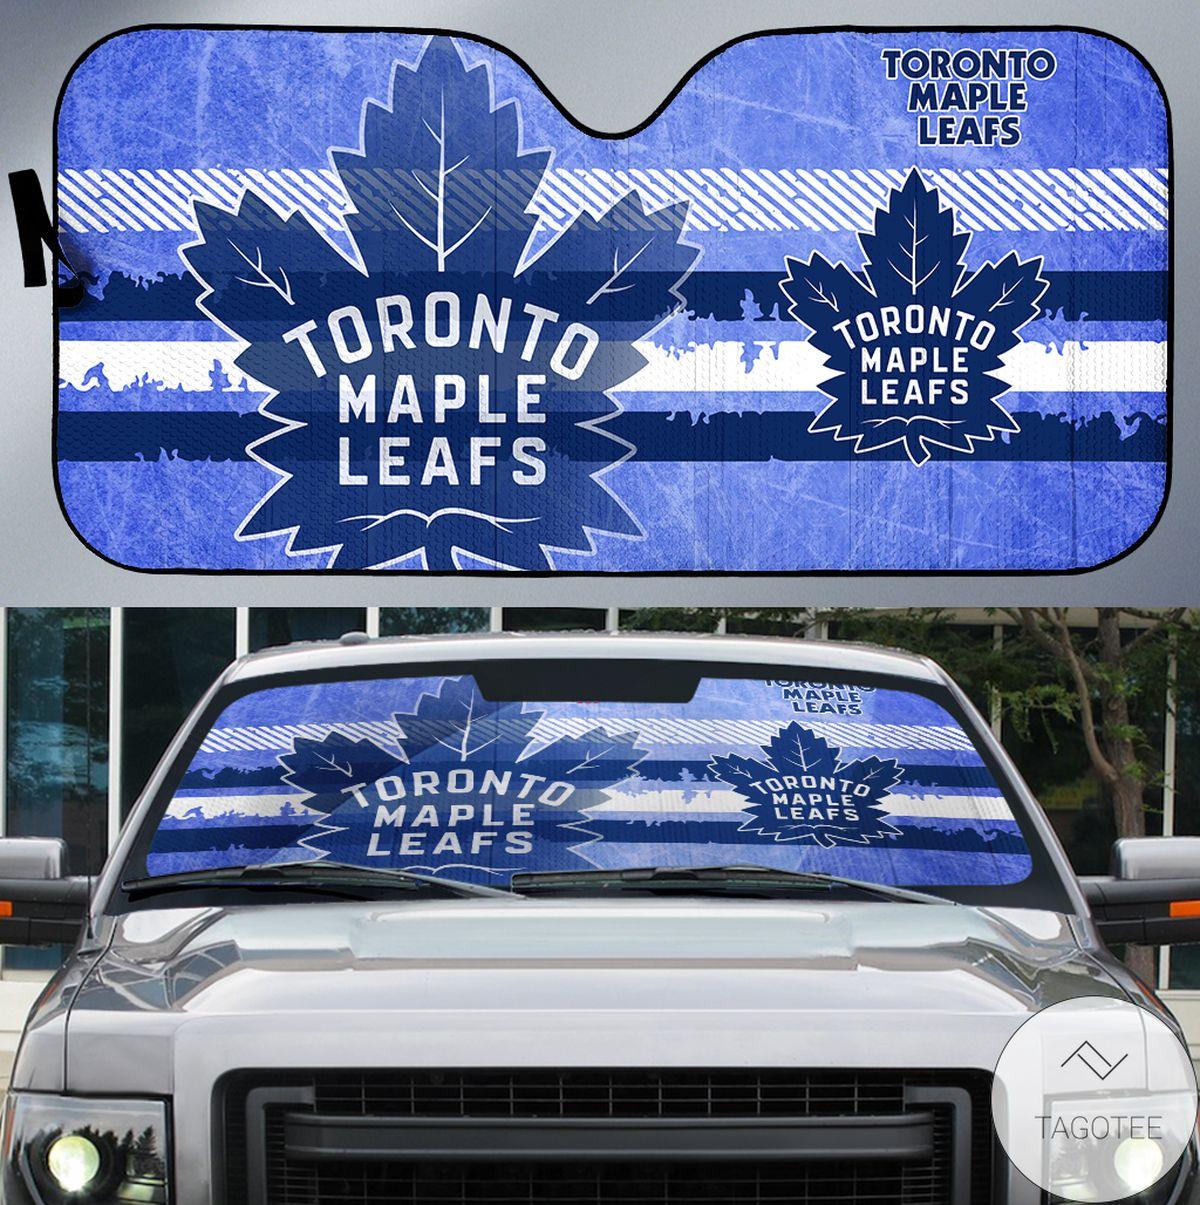 Toronto Maple Leafs Branded Universal Car Auto Sun Shade